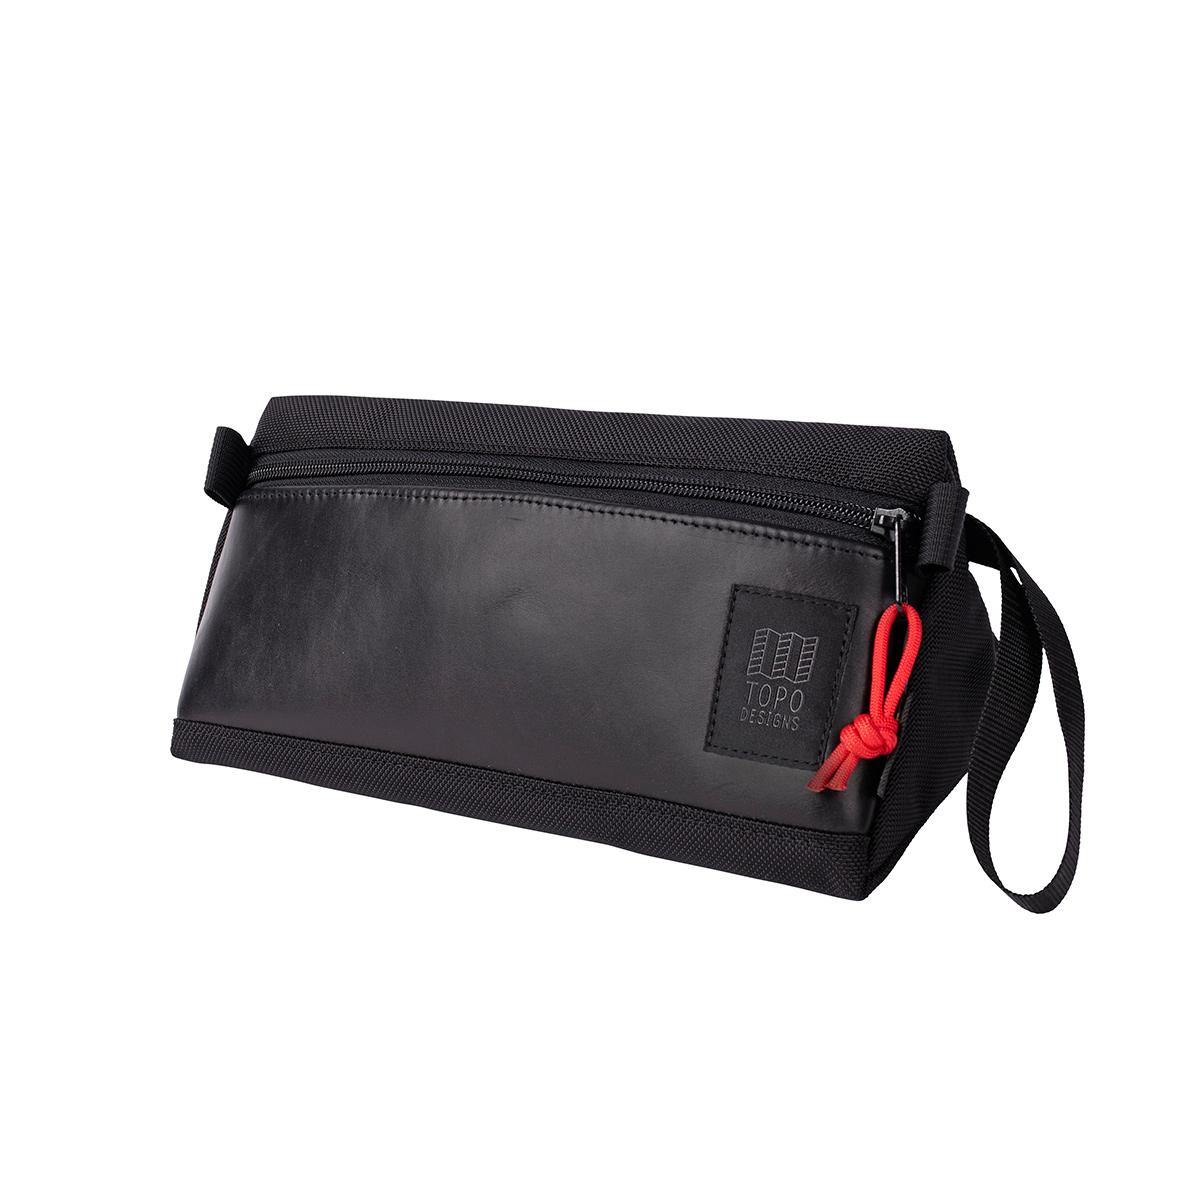 Topo Designs Dopp Kit Ballistic Black/Black Leather